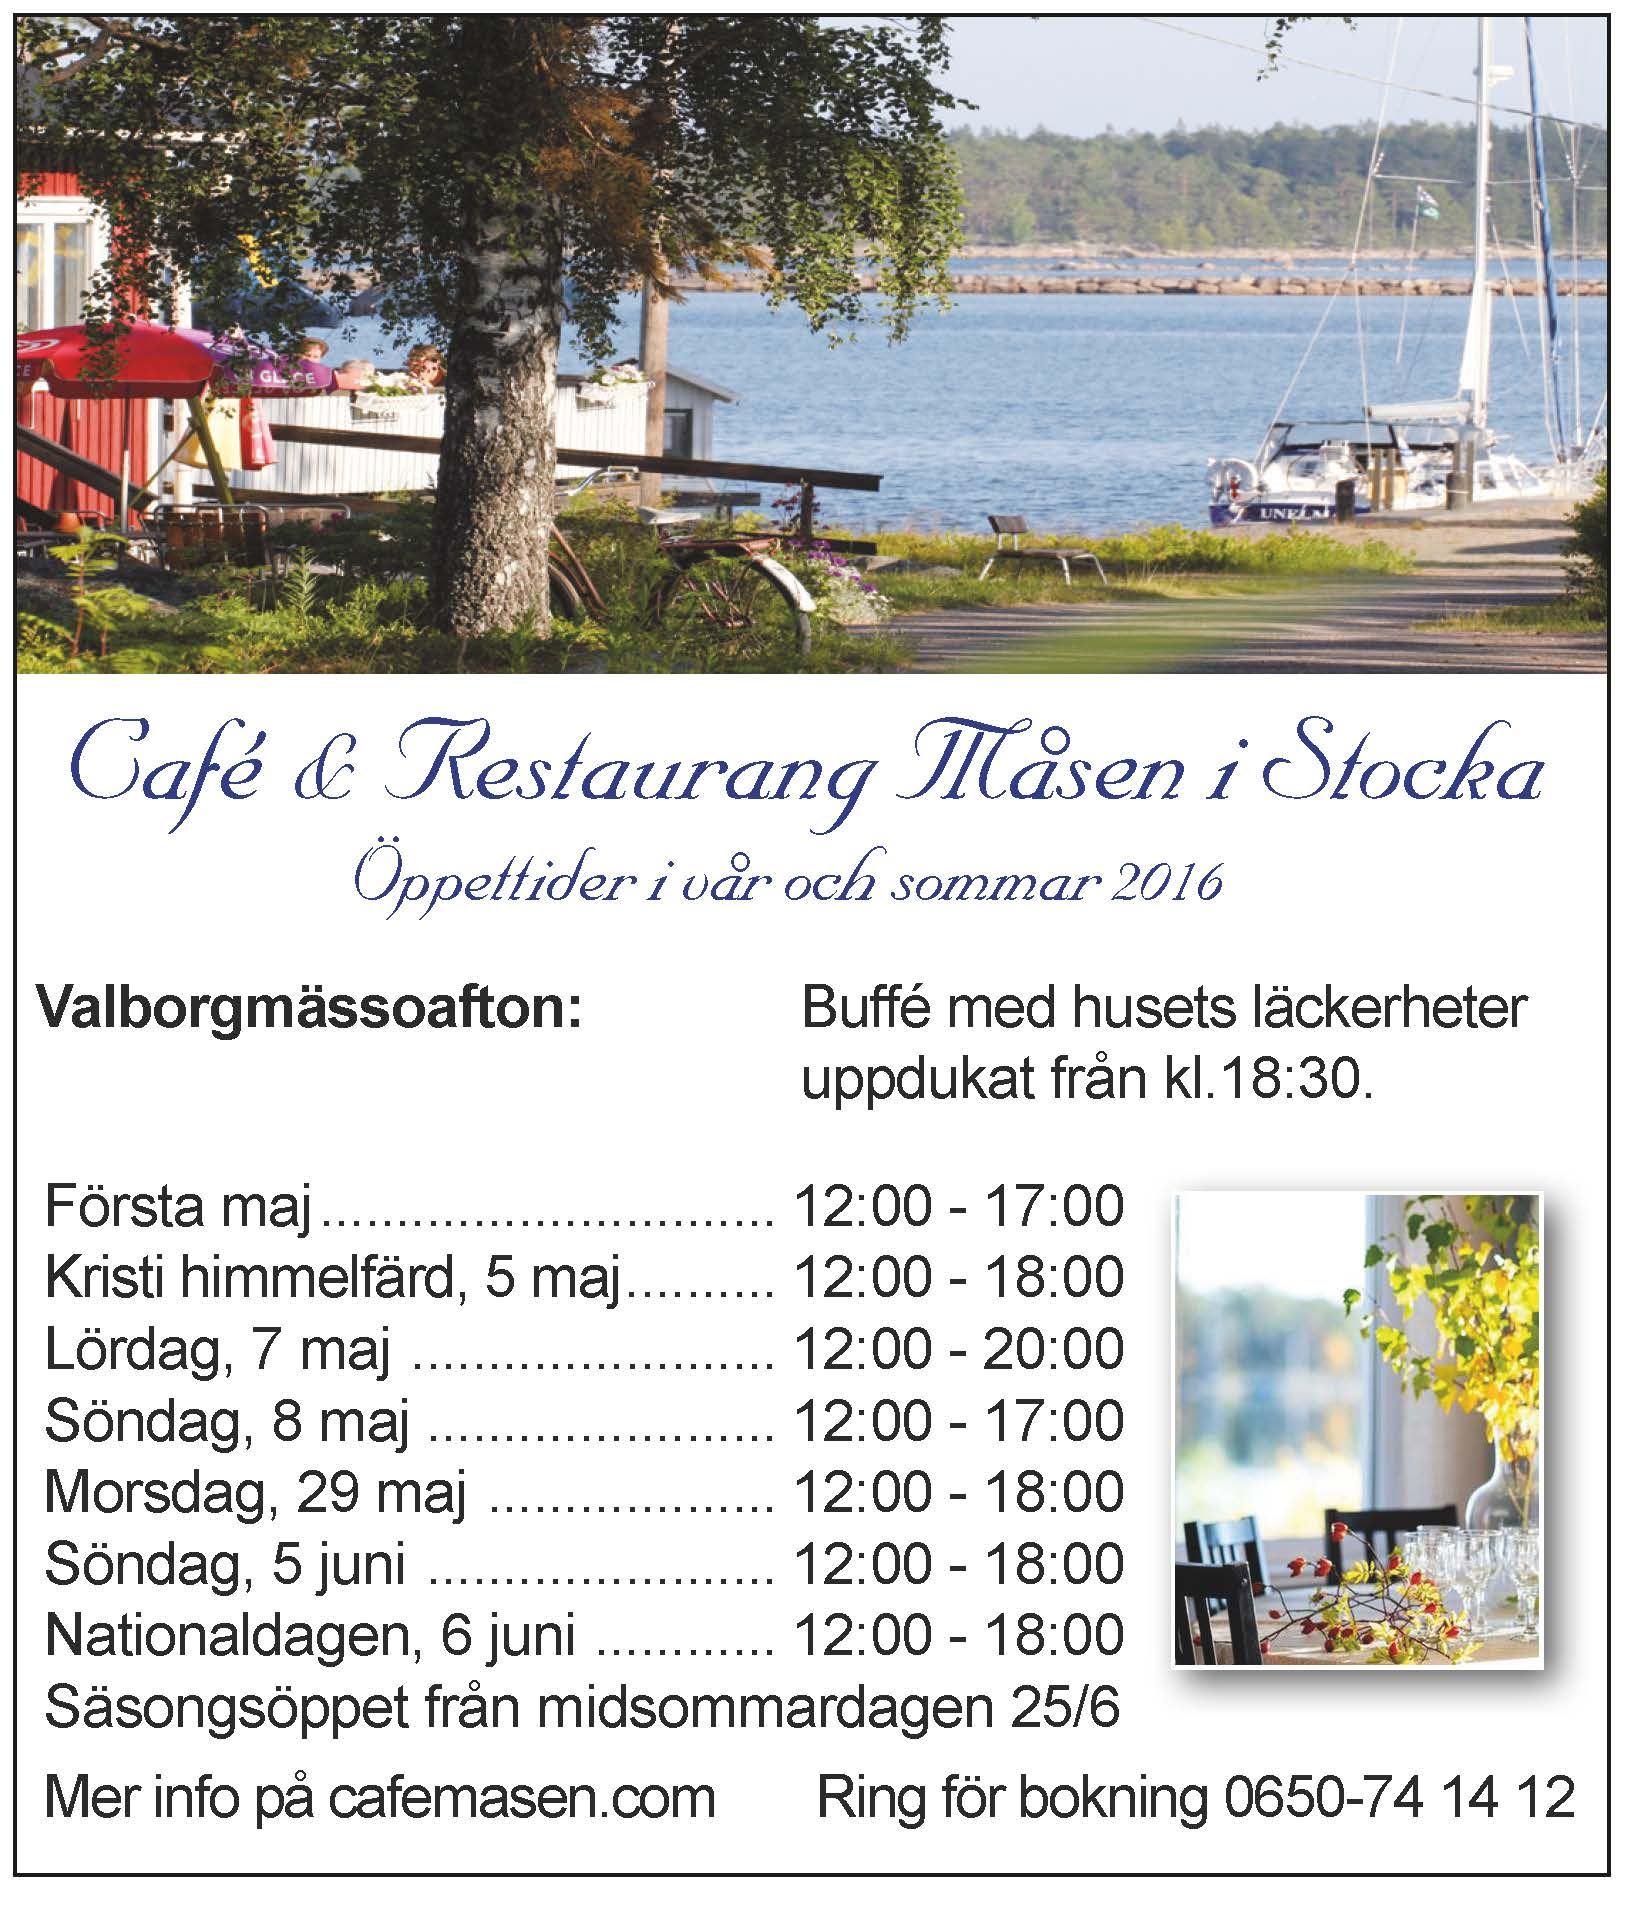 Café & Restaurang Måsen,  © Café & Restaurang Måsen, Café & Restaurang Måsen